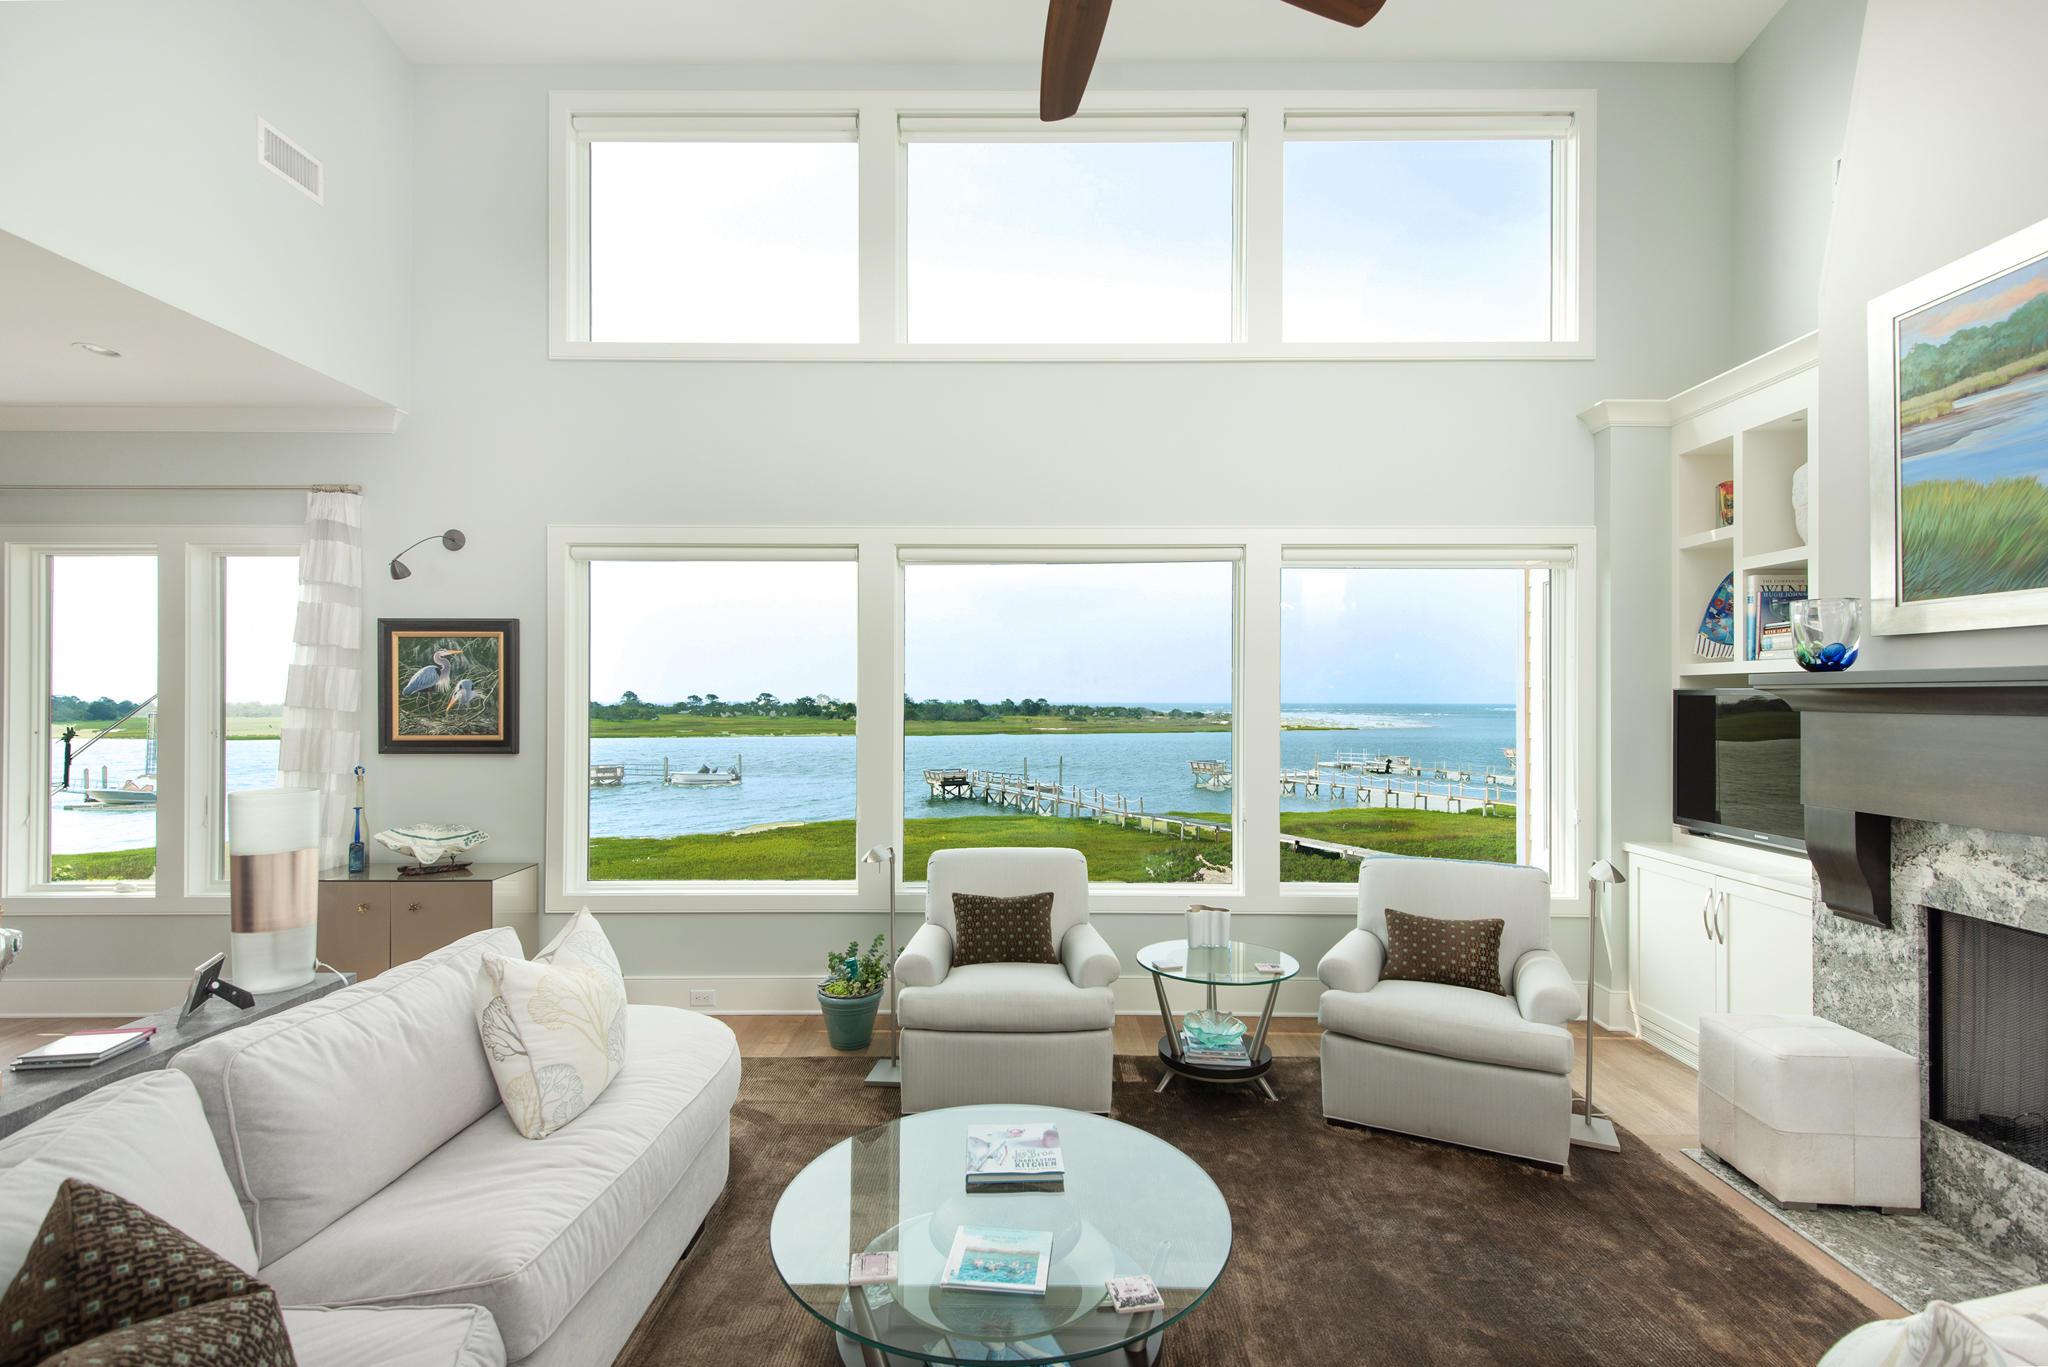 Seabrook Island Homes For Sale - 3135 Marshgate, Seabrook Island, SC - 58